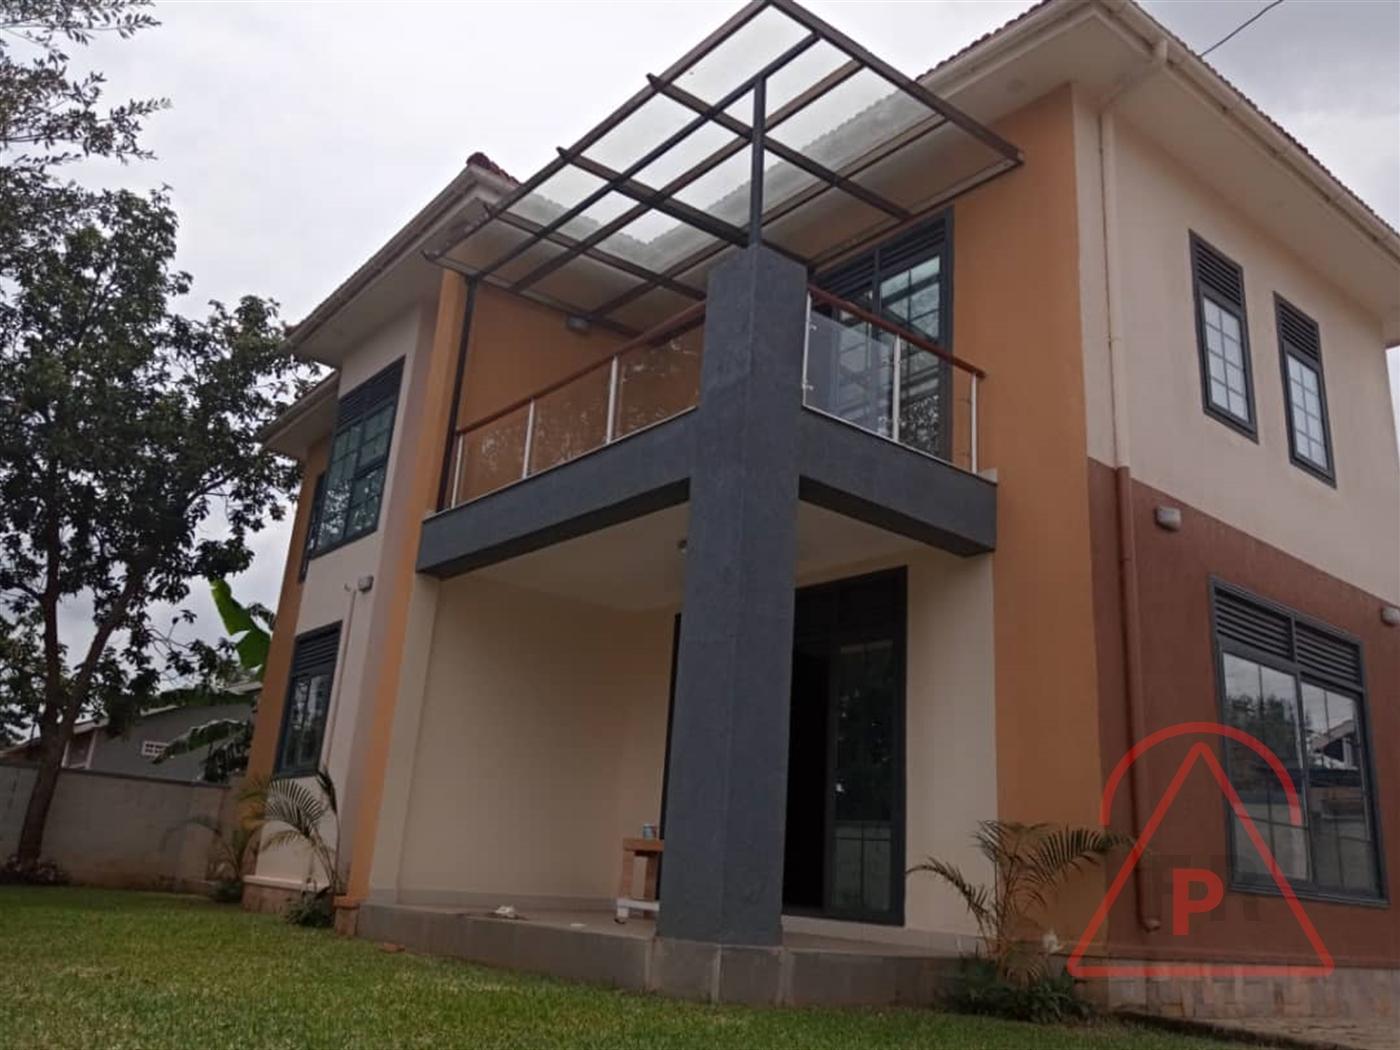 Mansion for sale in Kiwaatule Kampala